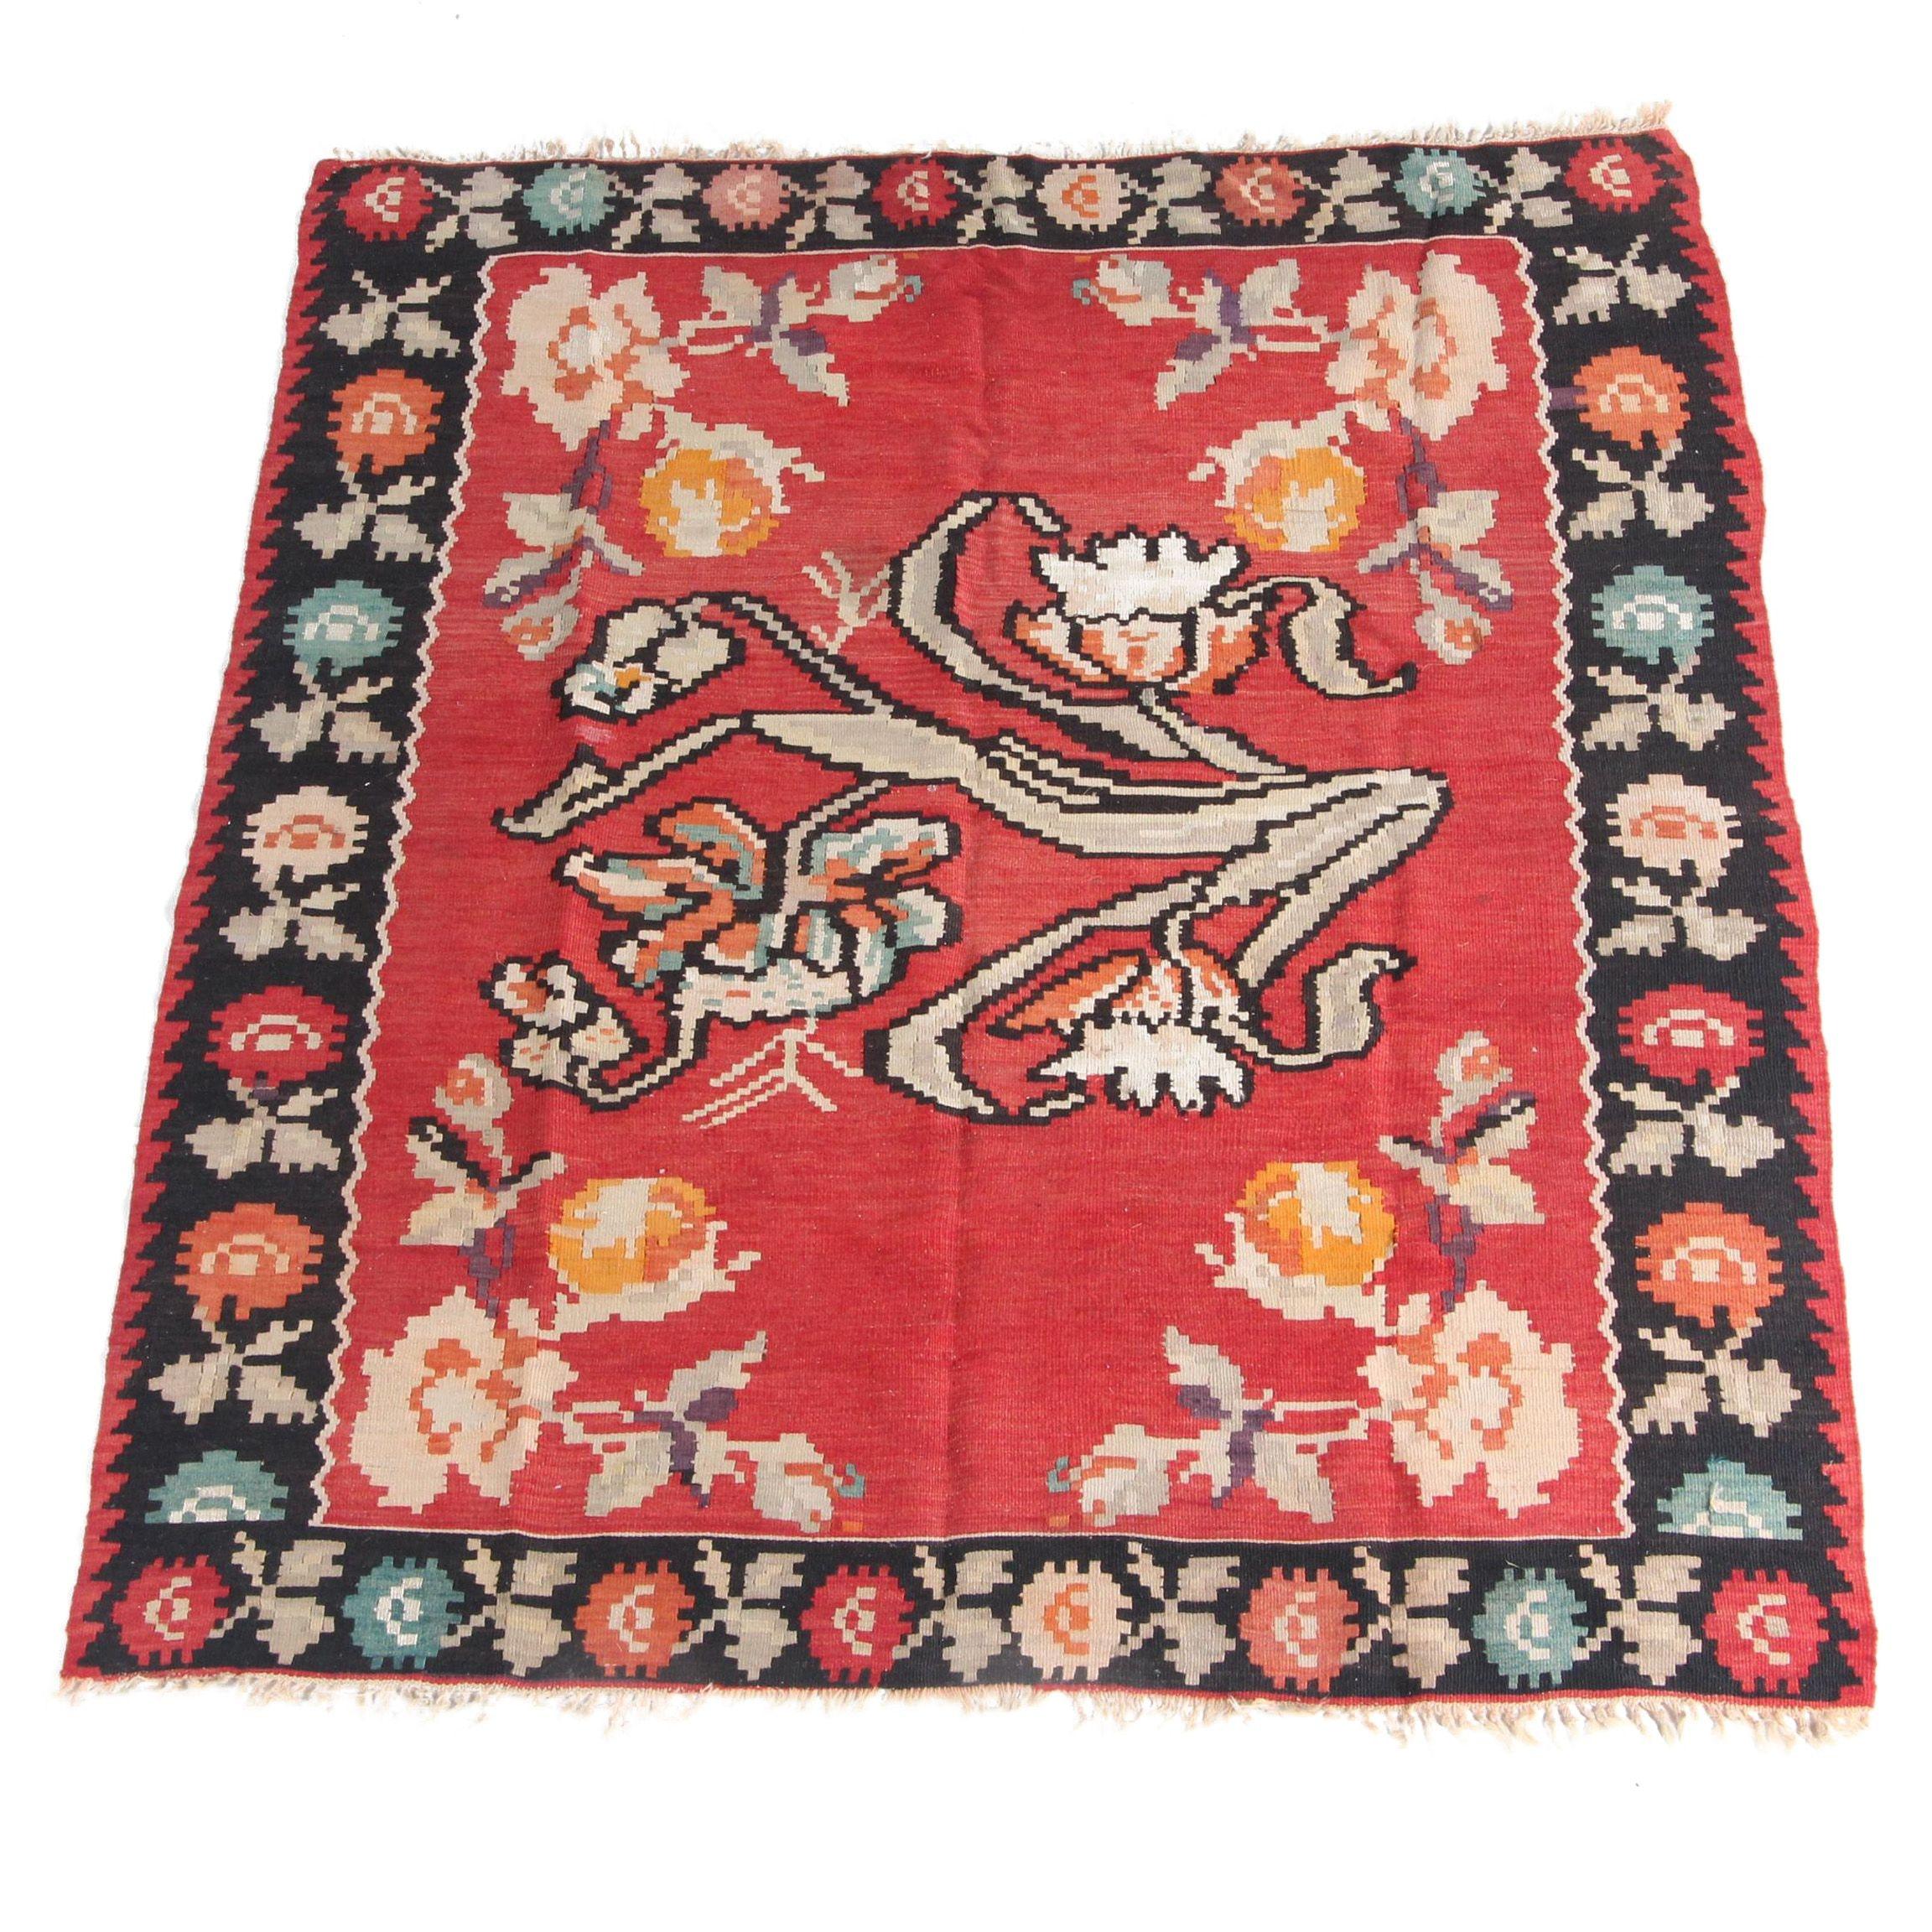 Vintage Handwoven Bessarabian Wool Kilim